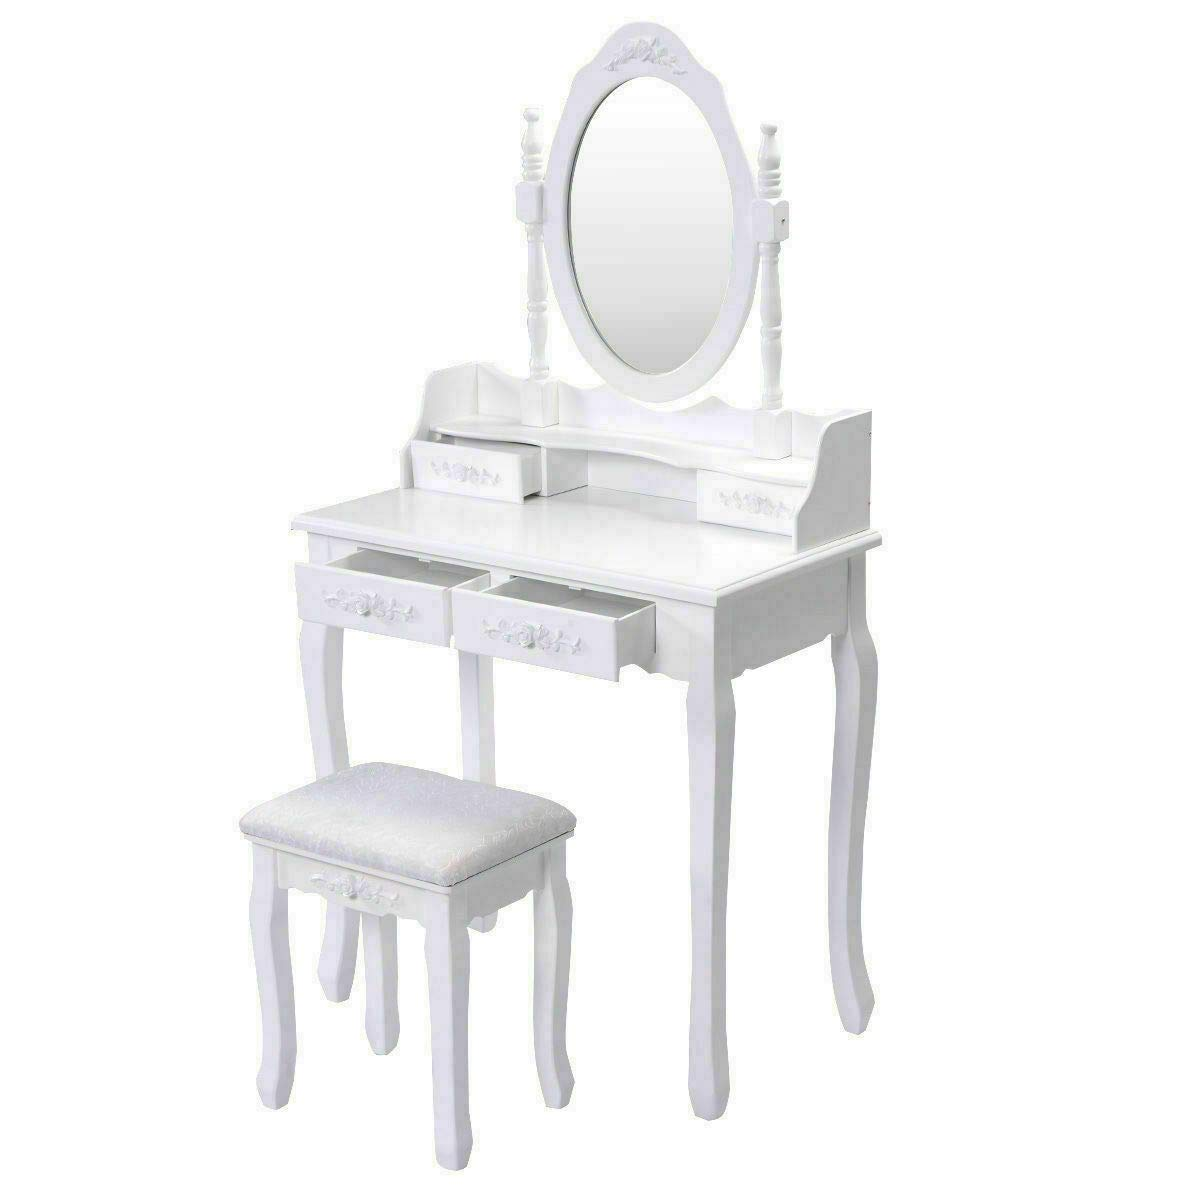 Beautiful and Elegantly Design, Glamorous Dressing, White Vanity Makeup Dressing Table Set W/Stool 4 Drawer&Mirror Jewelry Wood Desk